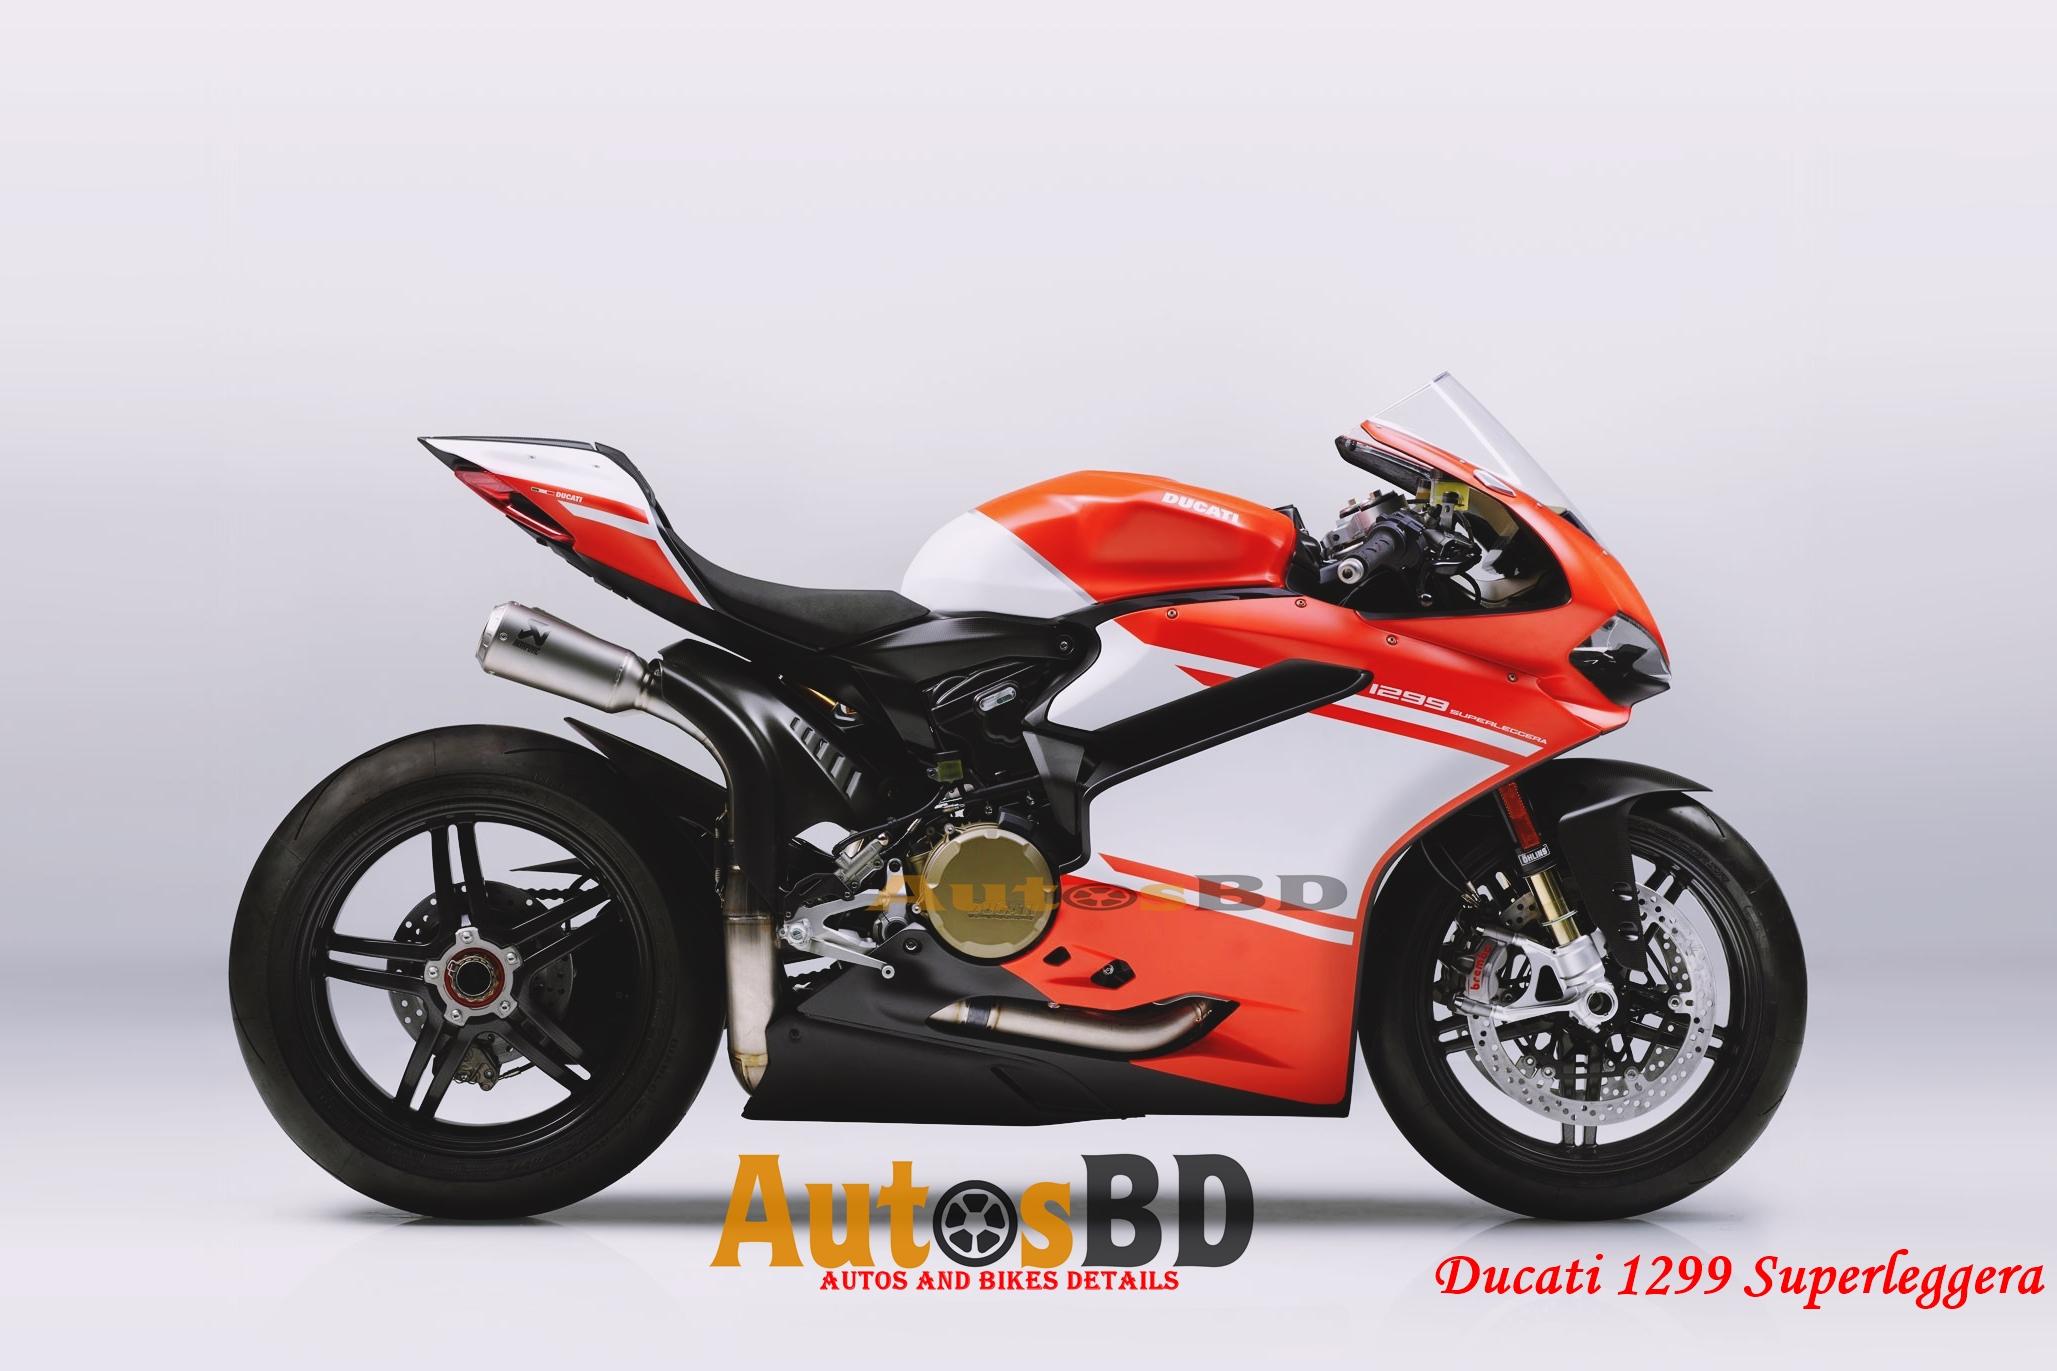 Ducati 1299 Superleggera Motorcycle Price in India